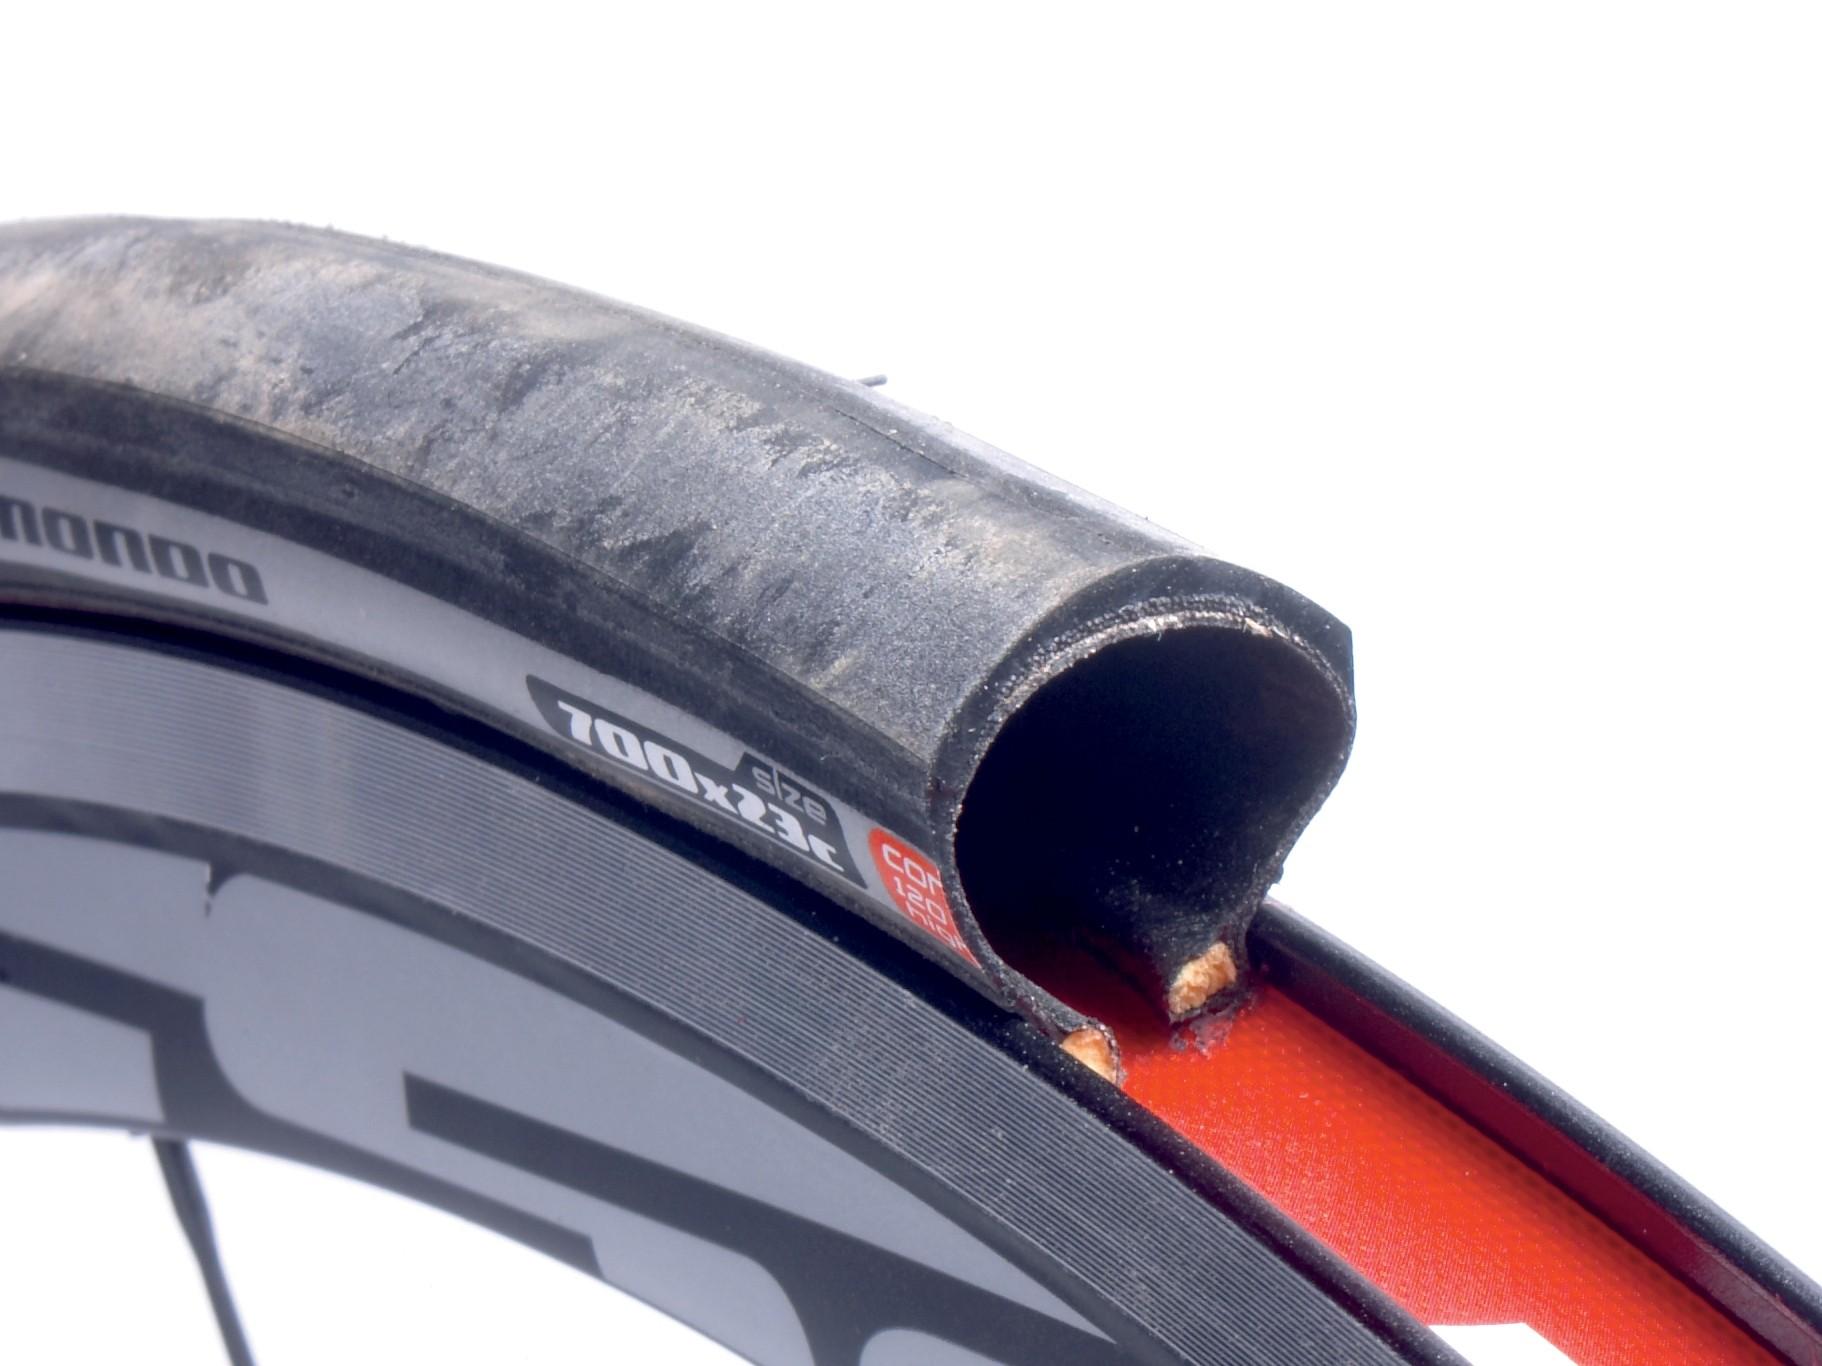 Mondo Pro: light, tough tyre that's good in the wet